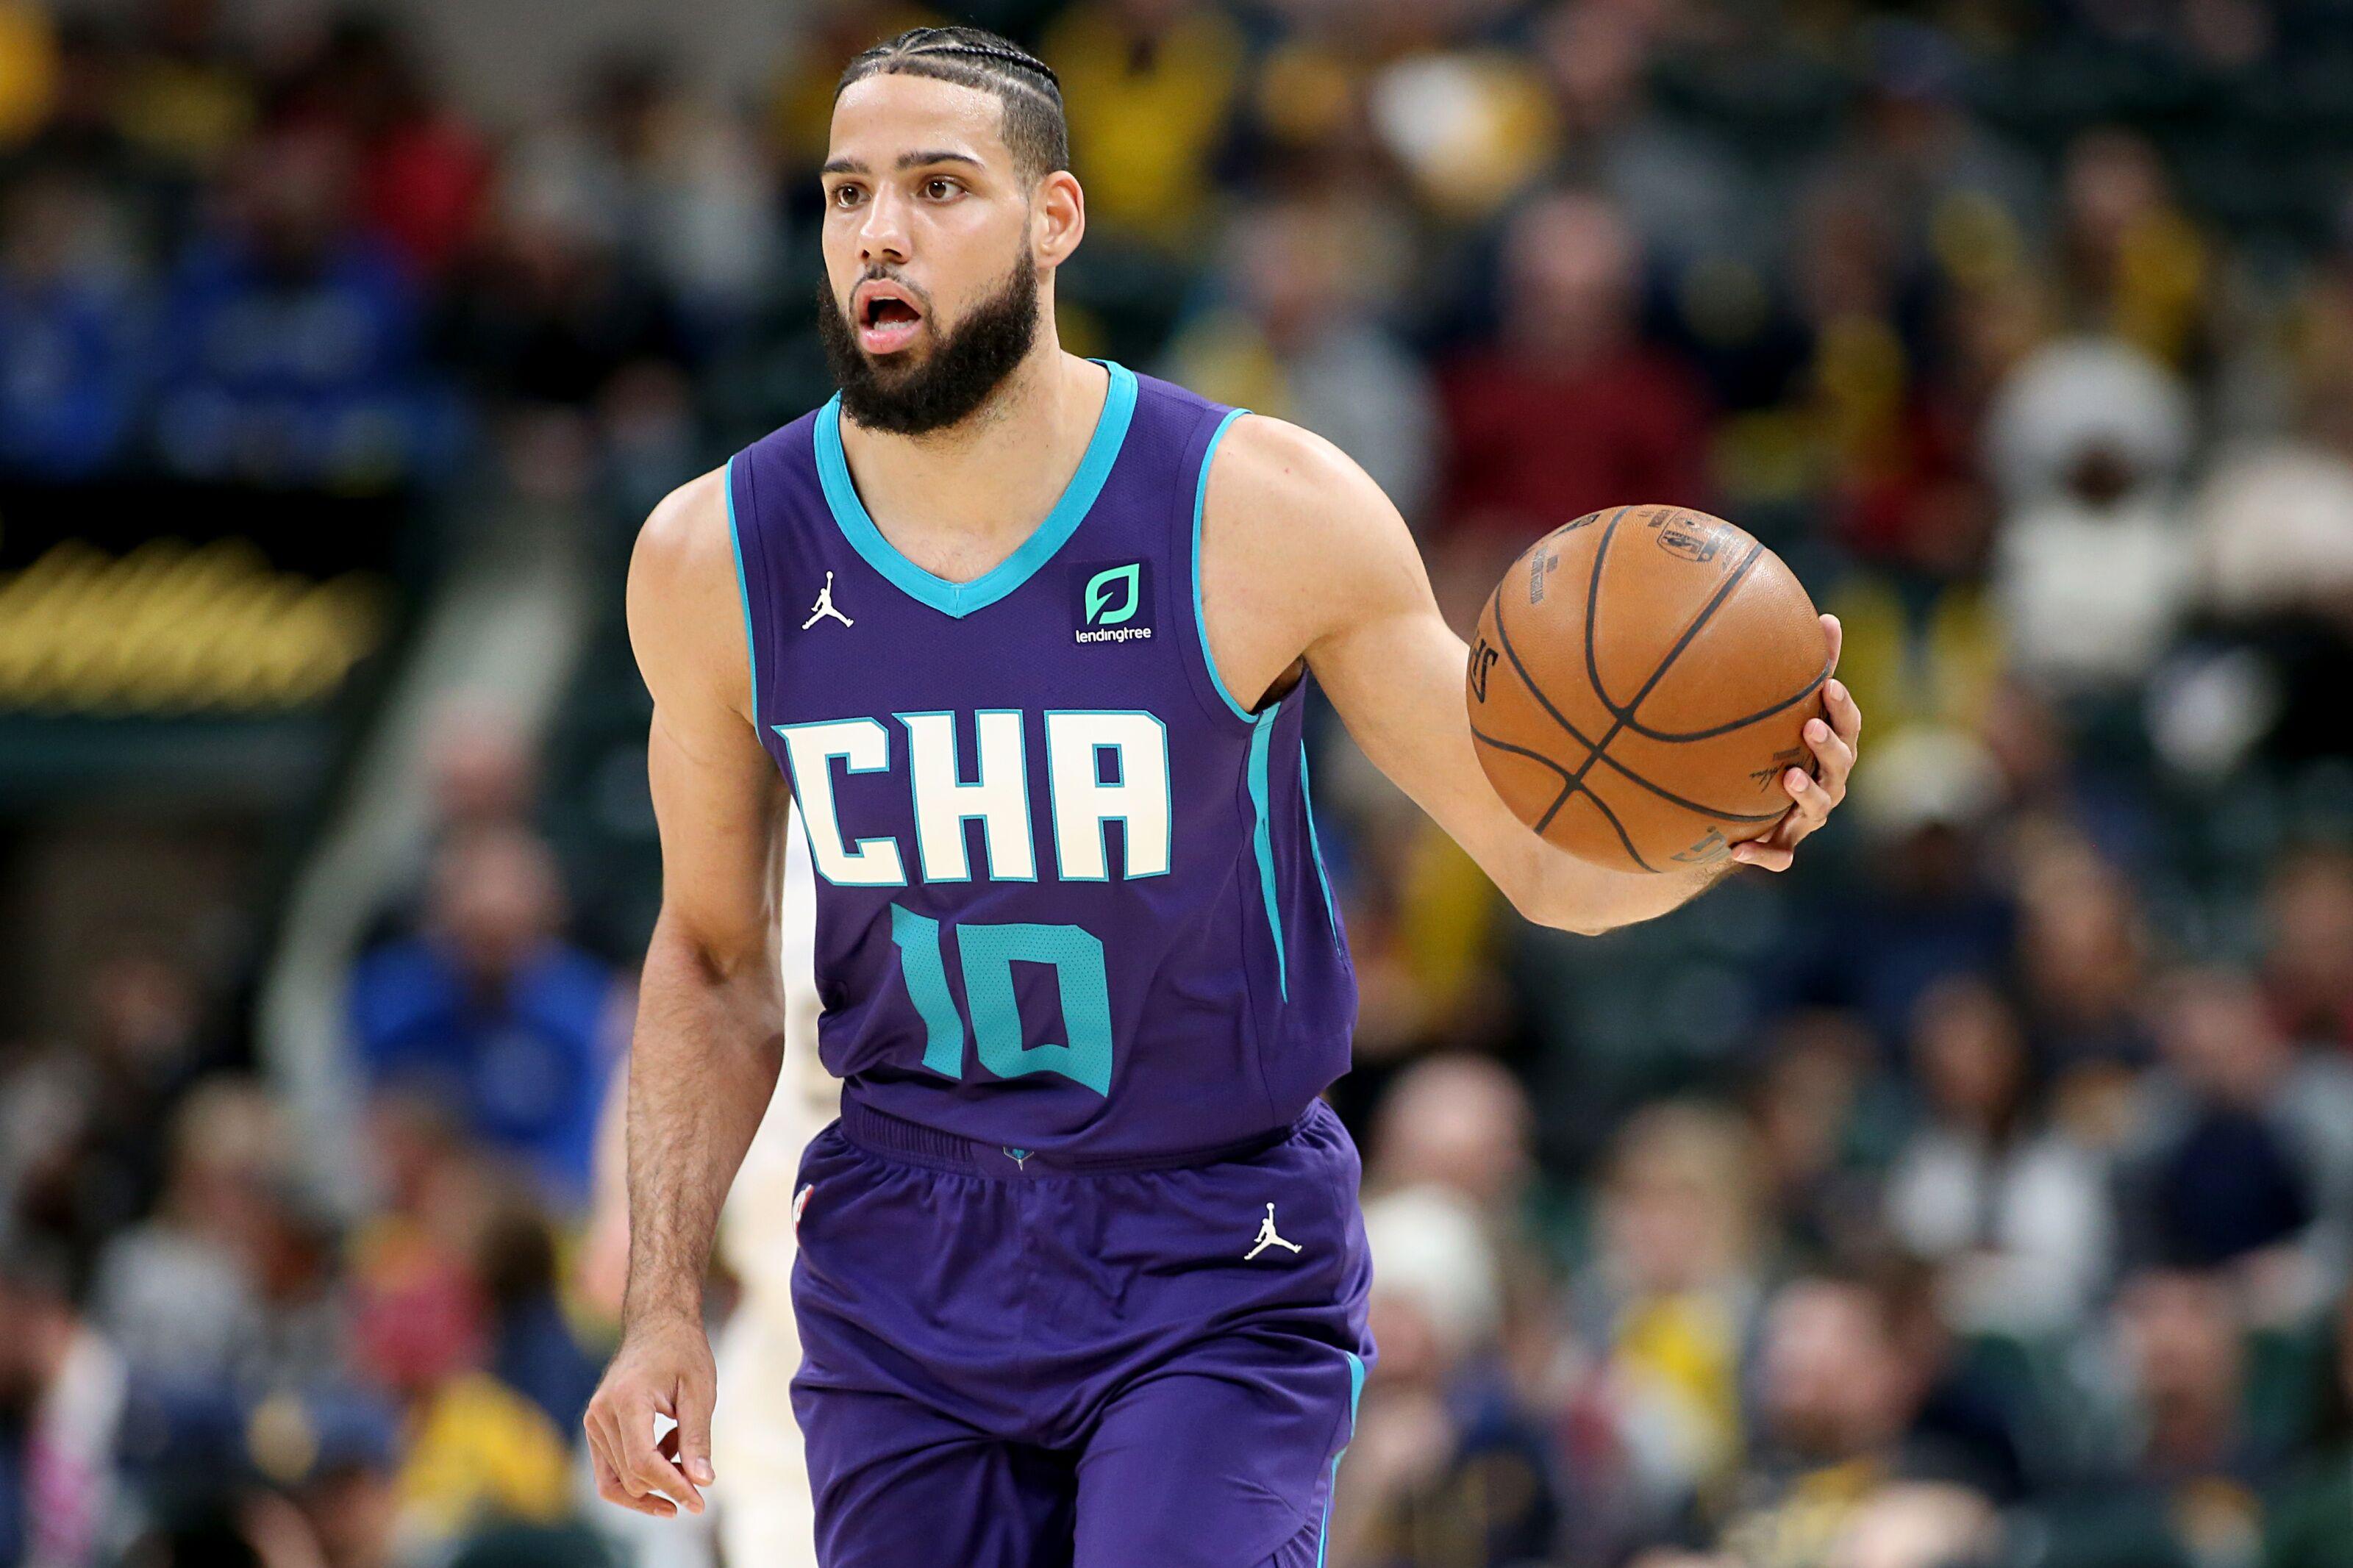 Charlotte Hornets: Caleb Martin looks too good for G-League